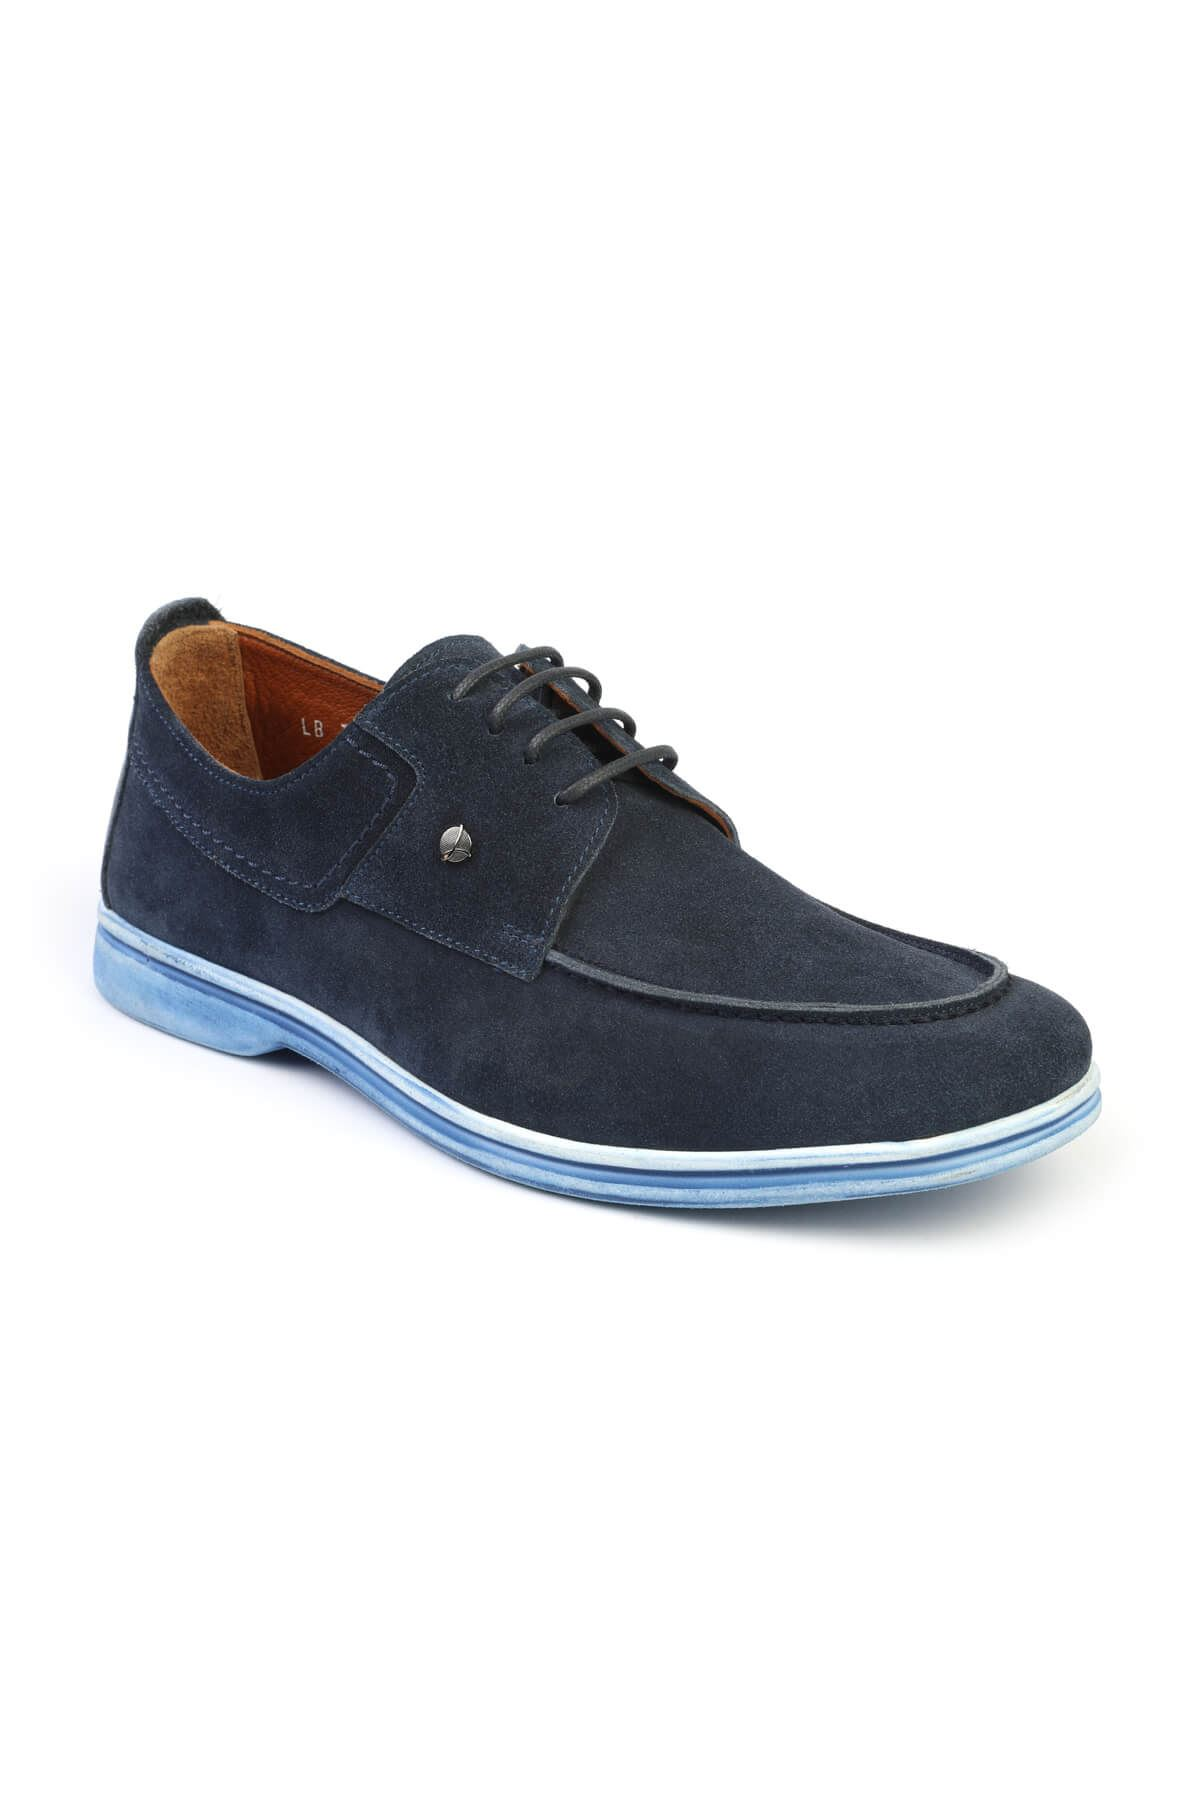 Libero 3005 Navy Blue Casual Shoes